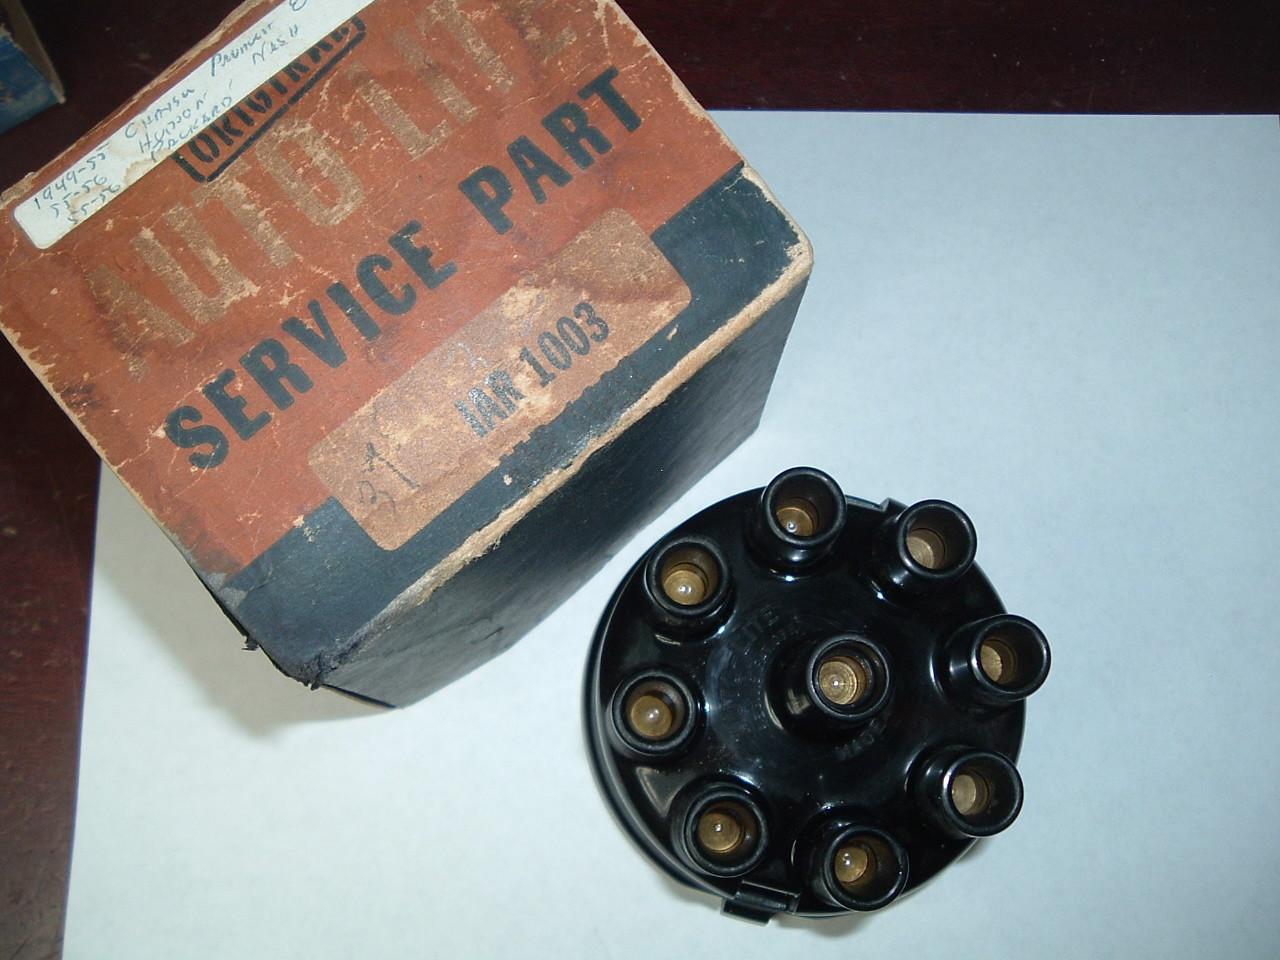 1949 50 51 52 5354 Chrysler Packard autolite script distributor cap IAR-1003 (z Iar1003)